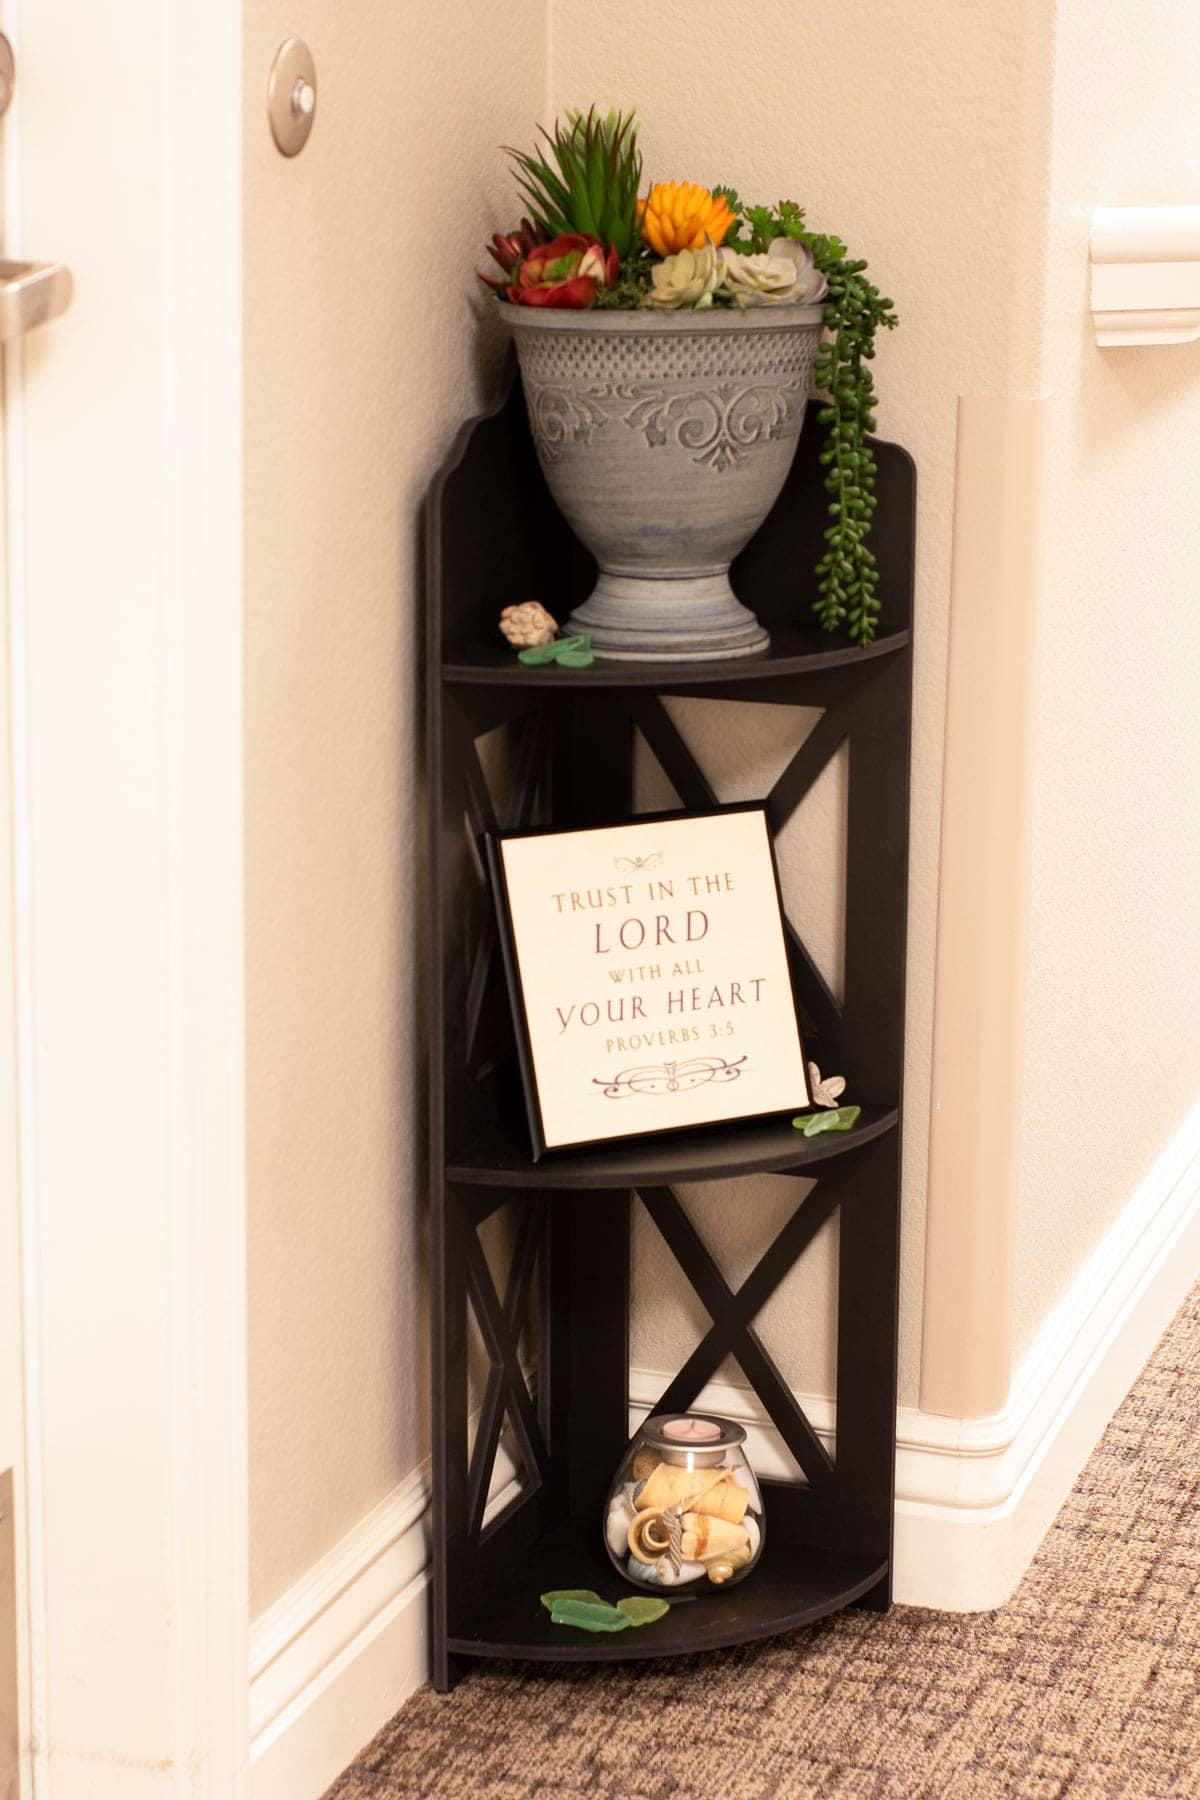 corner shelf unit outside apartment door